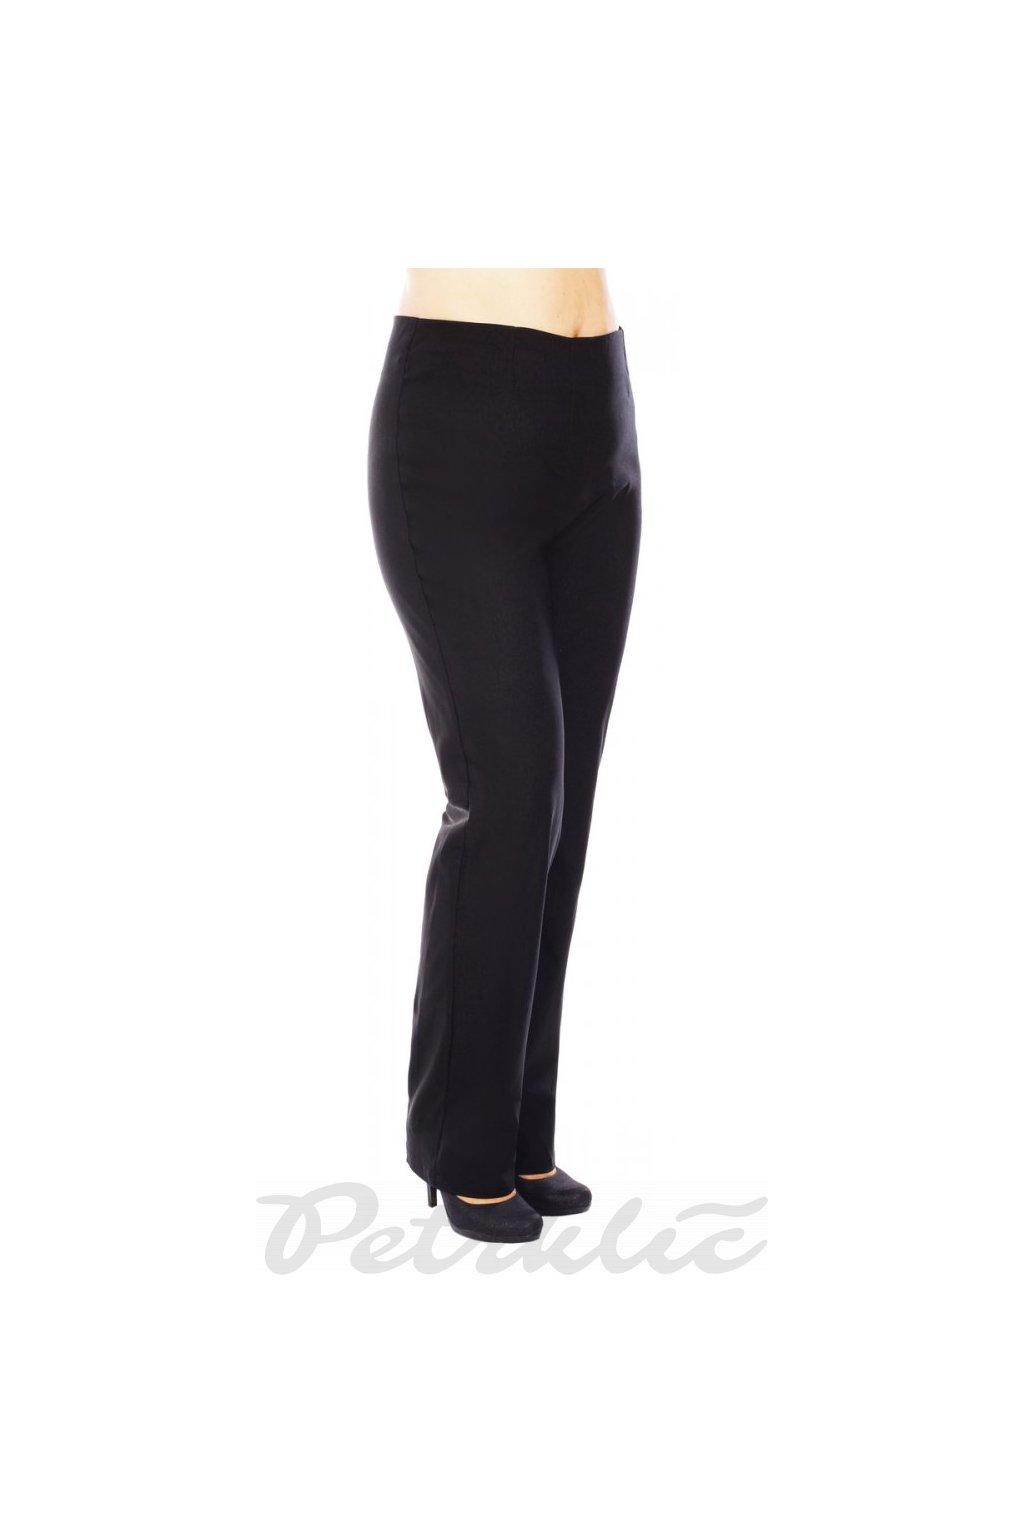 PAULA - elastické kalhoty